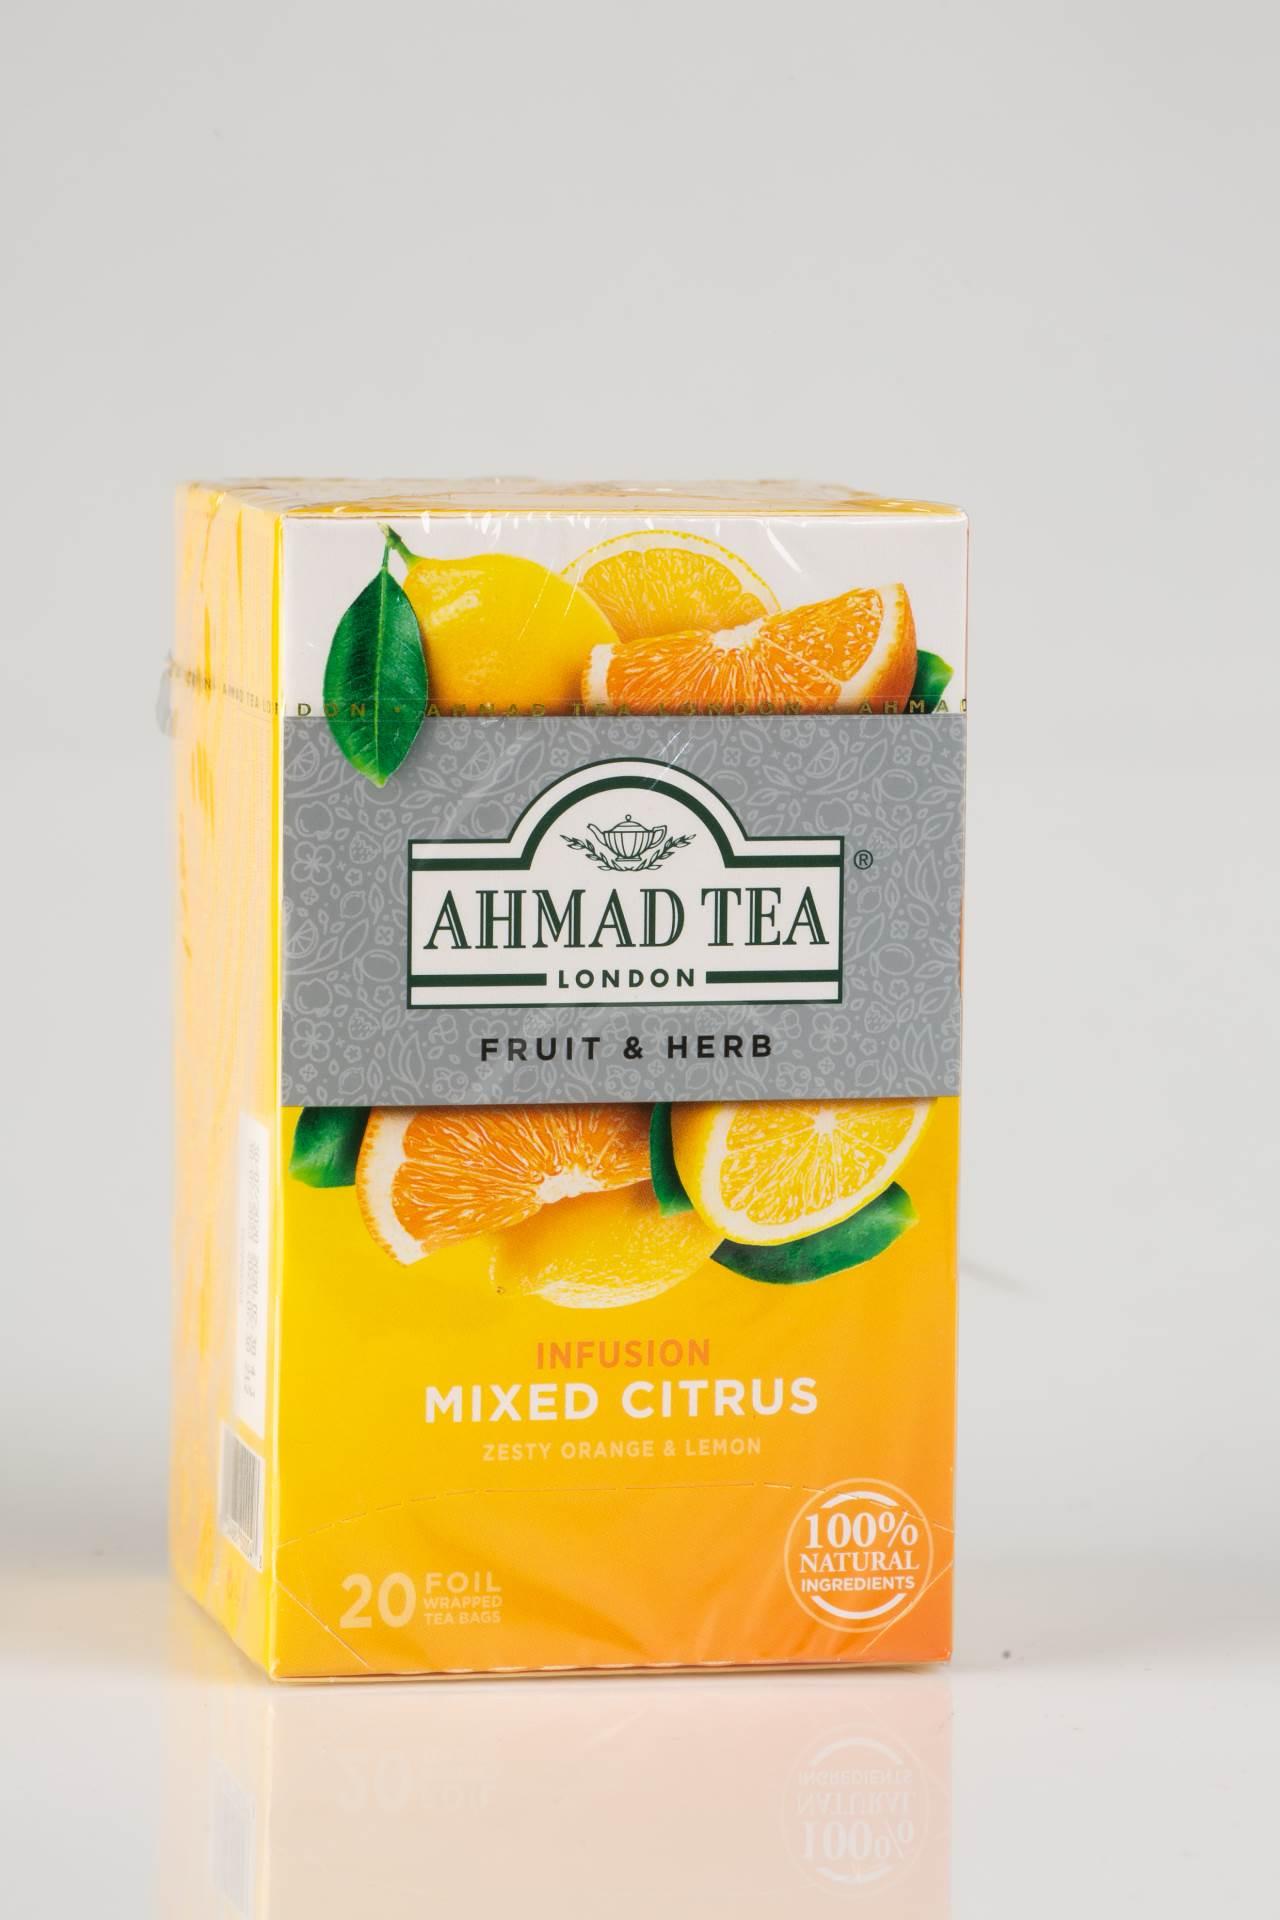 AHMAD čaj citrus mix20 fv, dm TRAJNO DOBRA CIJENA 17,90 kn